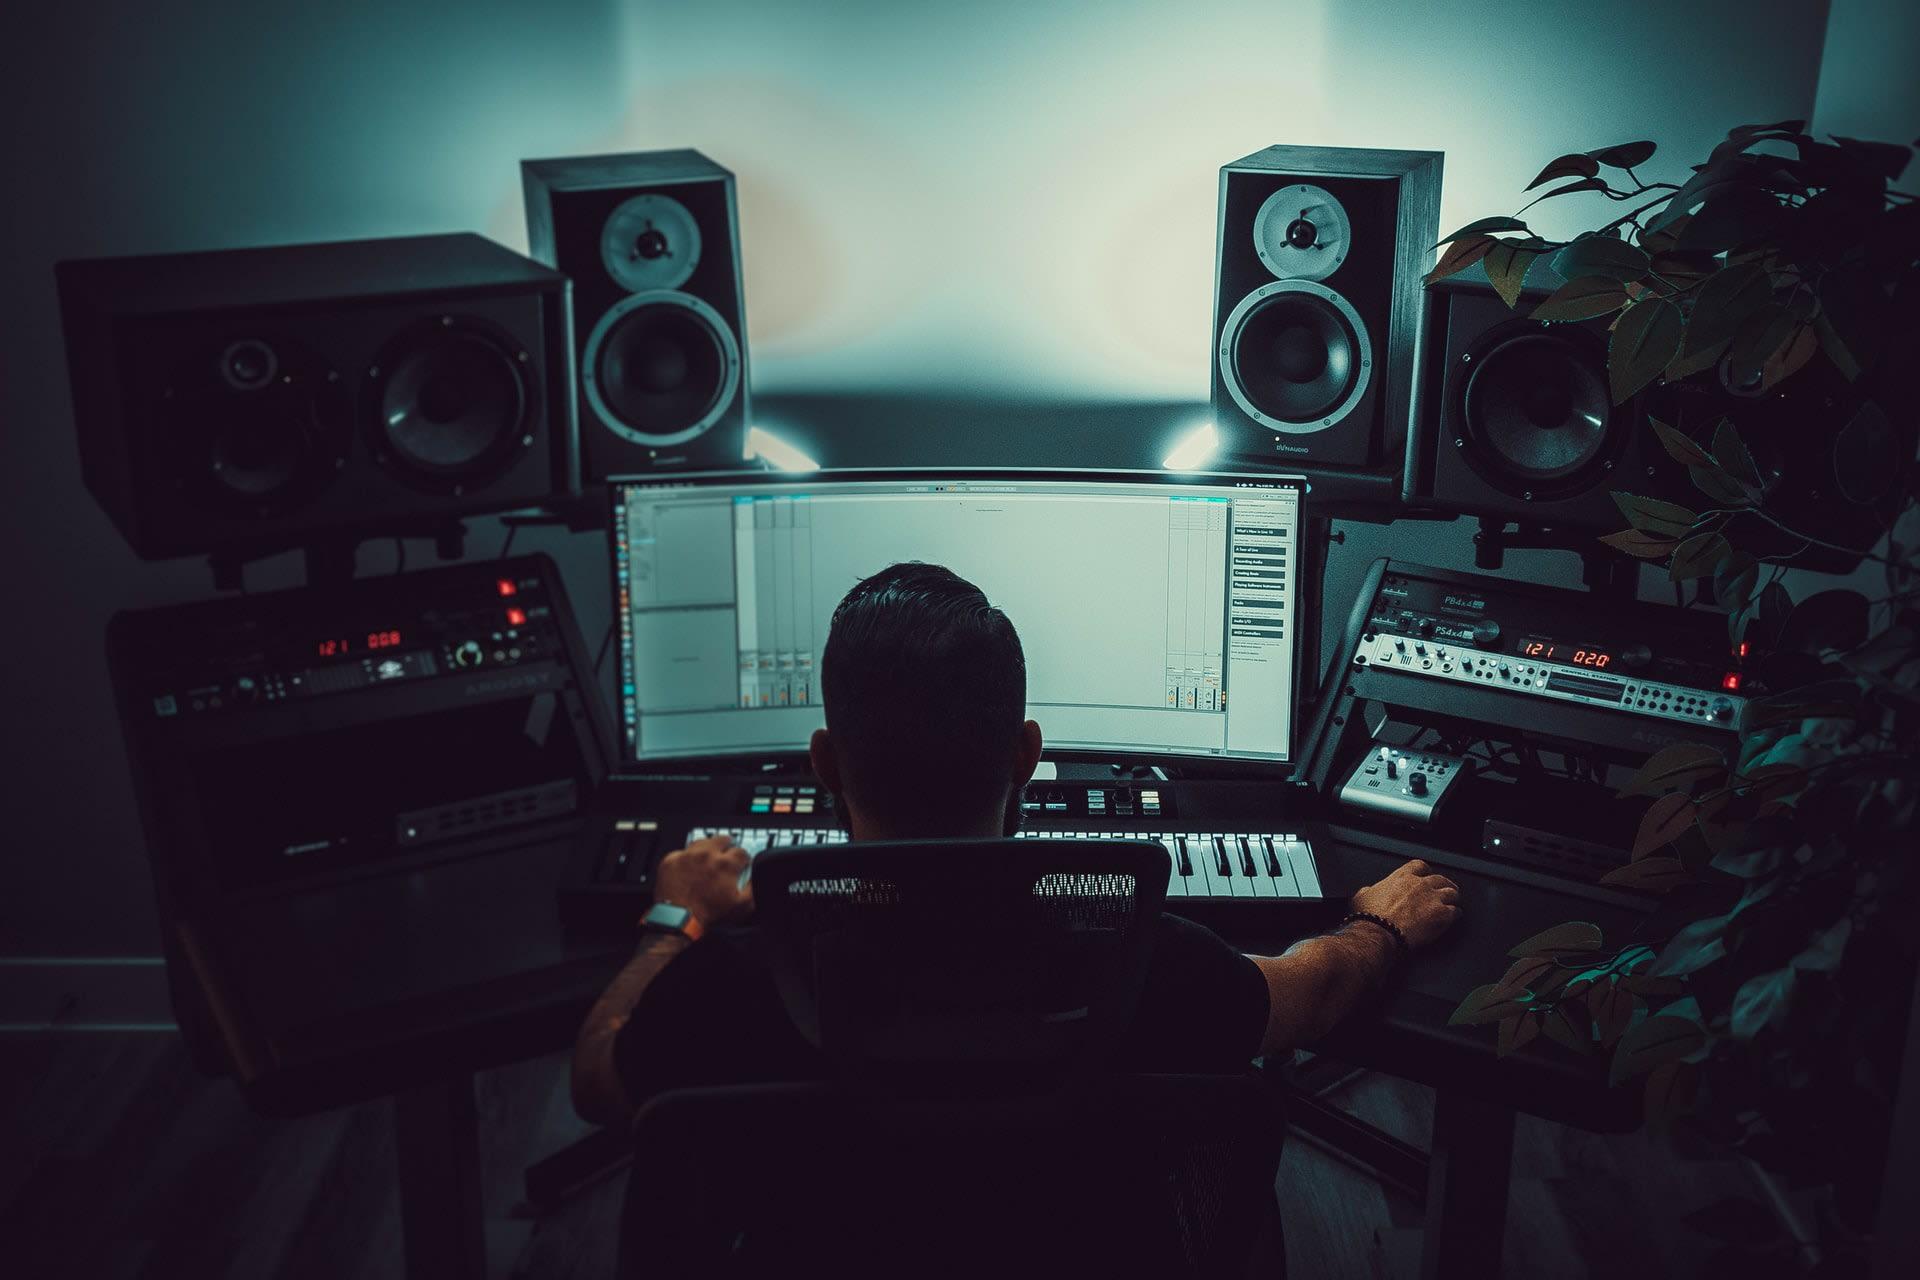 Portfolio for podcast/audio editing